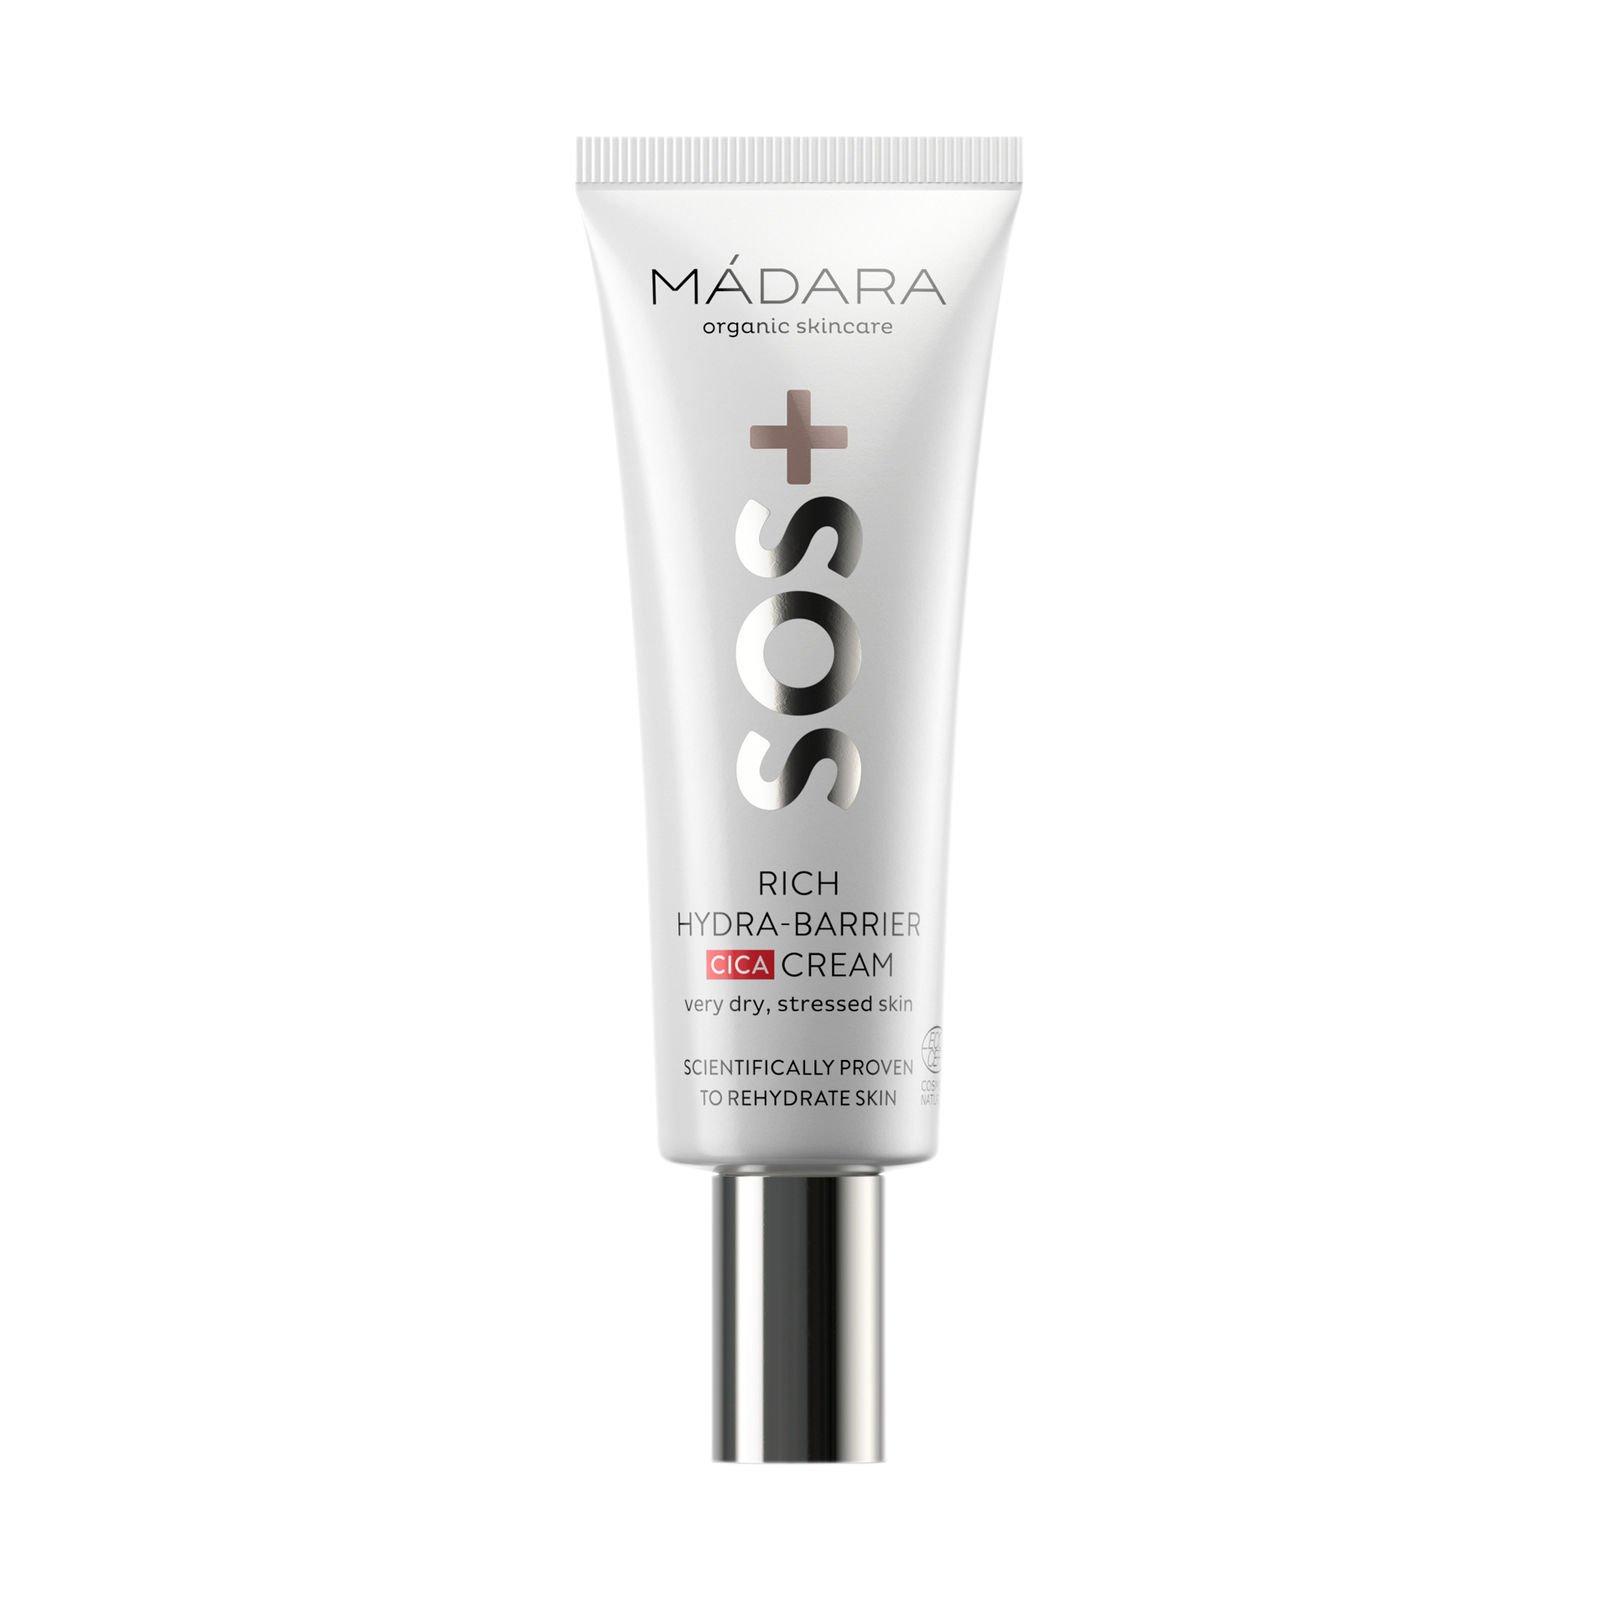 Mádara - SOS Rich Hydra-Barrier CICA Cream 40 ml